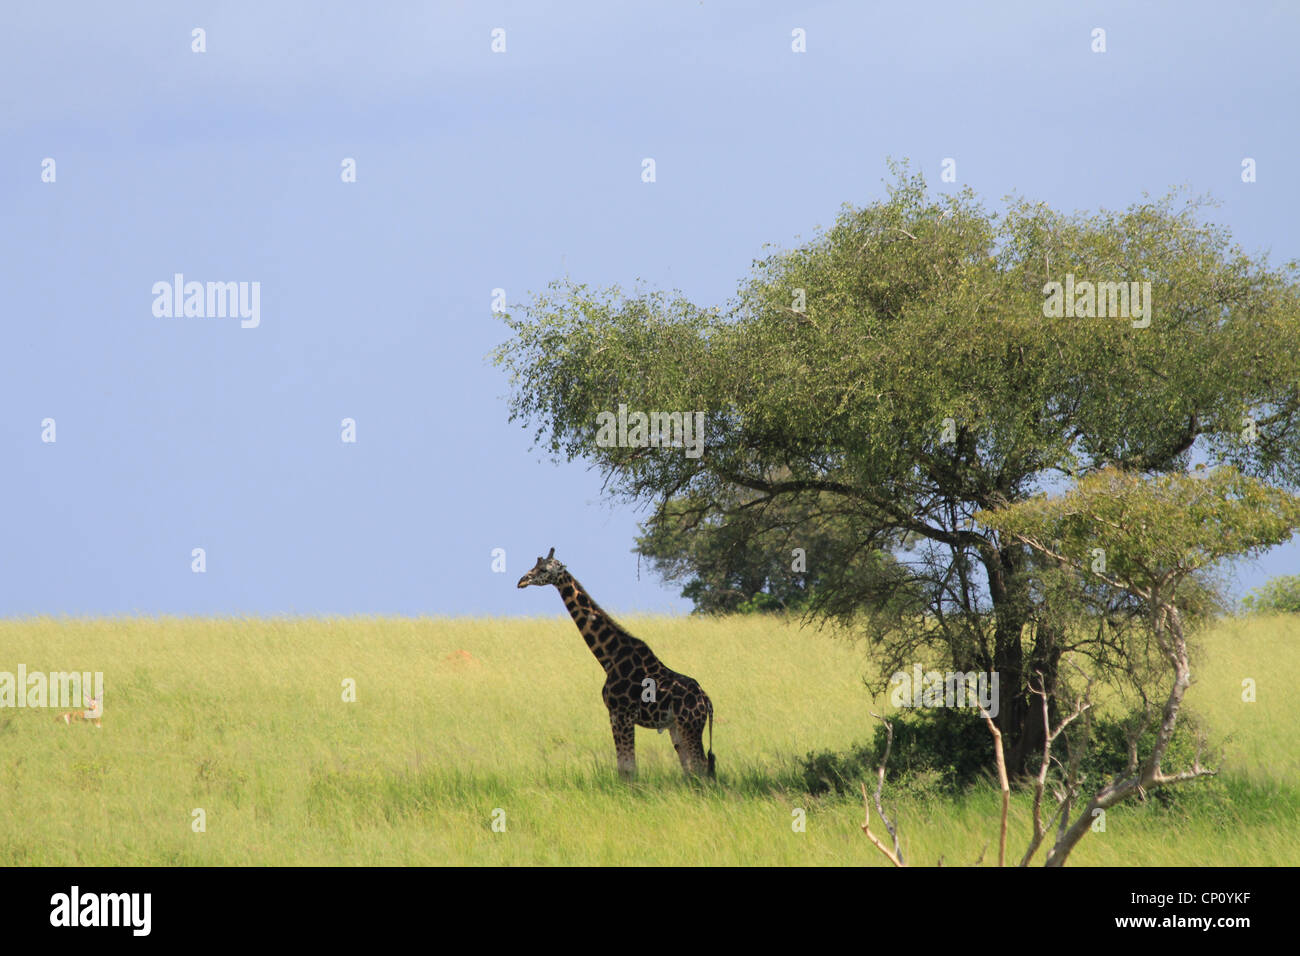 Mature male Rothschild's Giraffe (Giraffe camelopardis rothschildi) at Murchison Falls National Park, Uganda - Stock Image